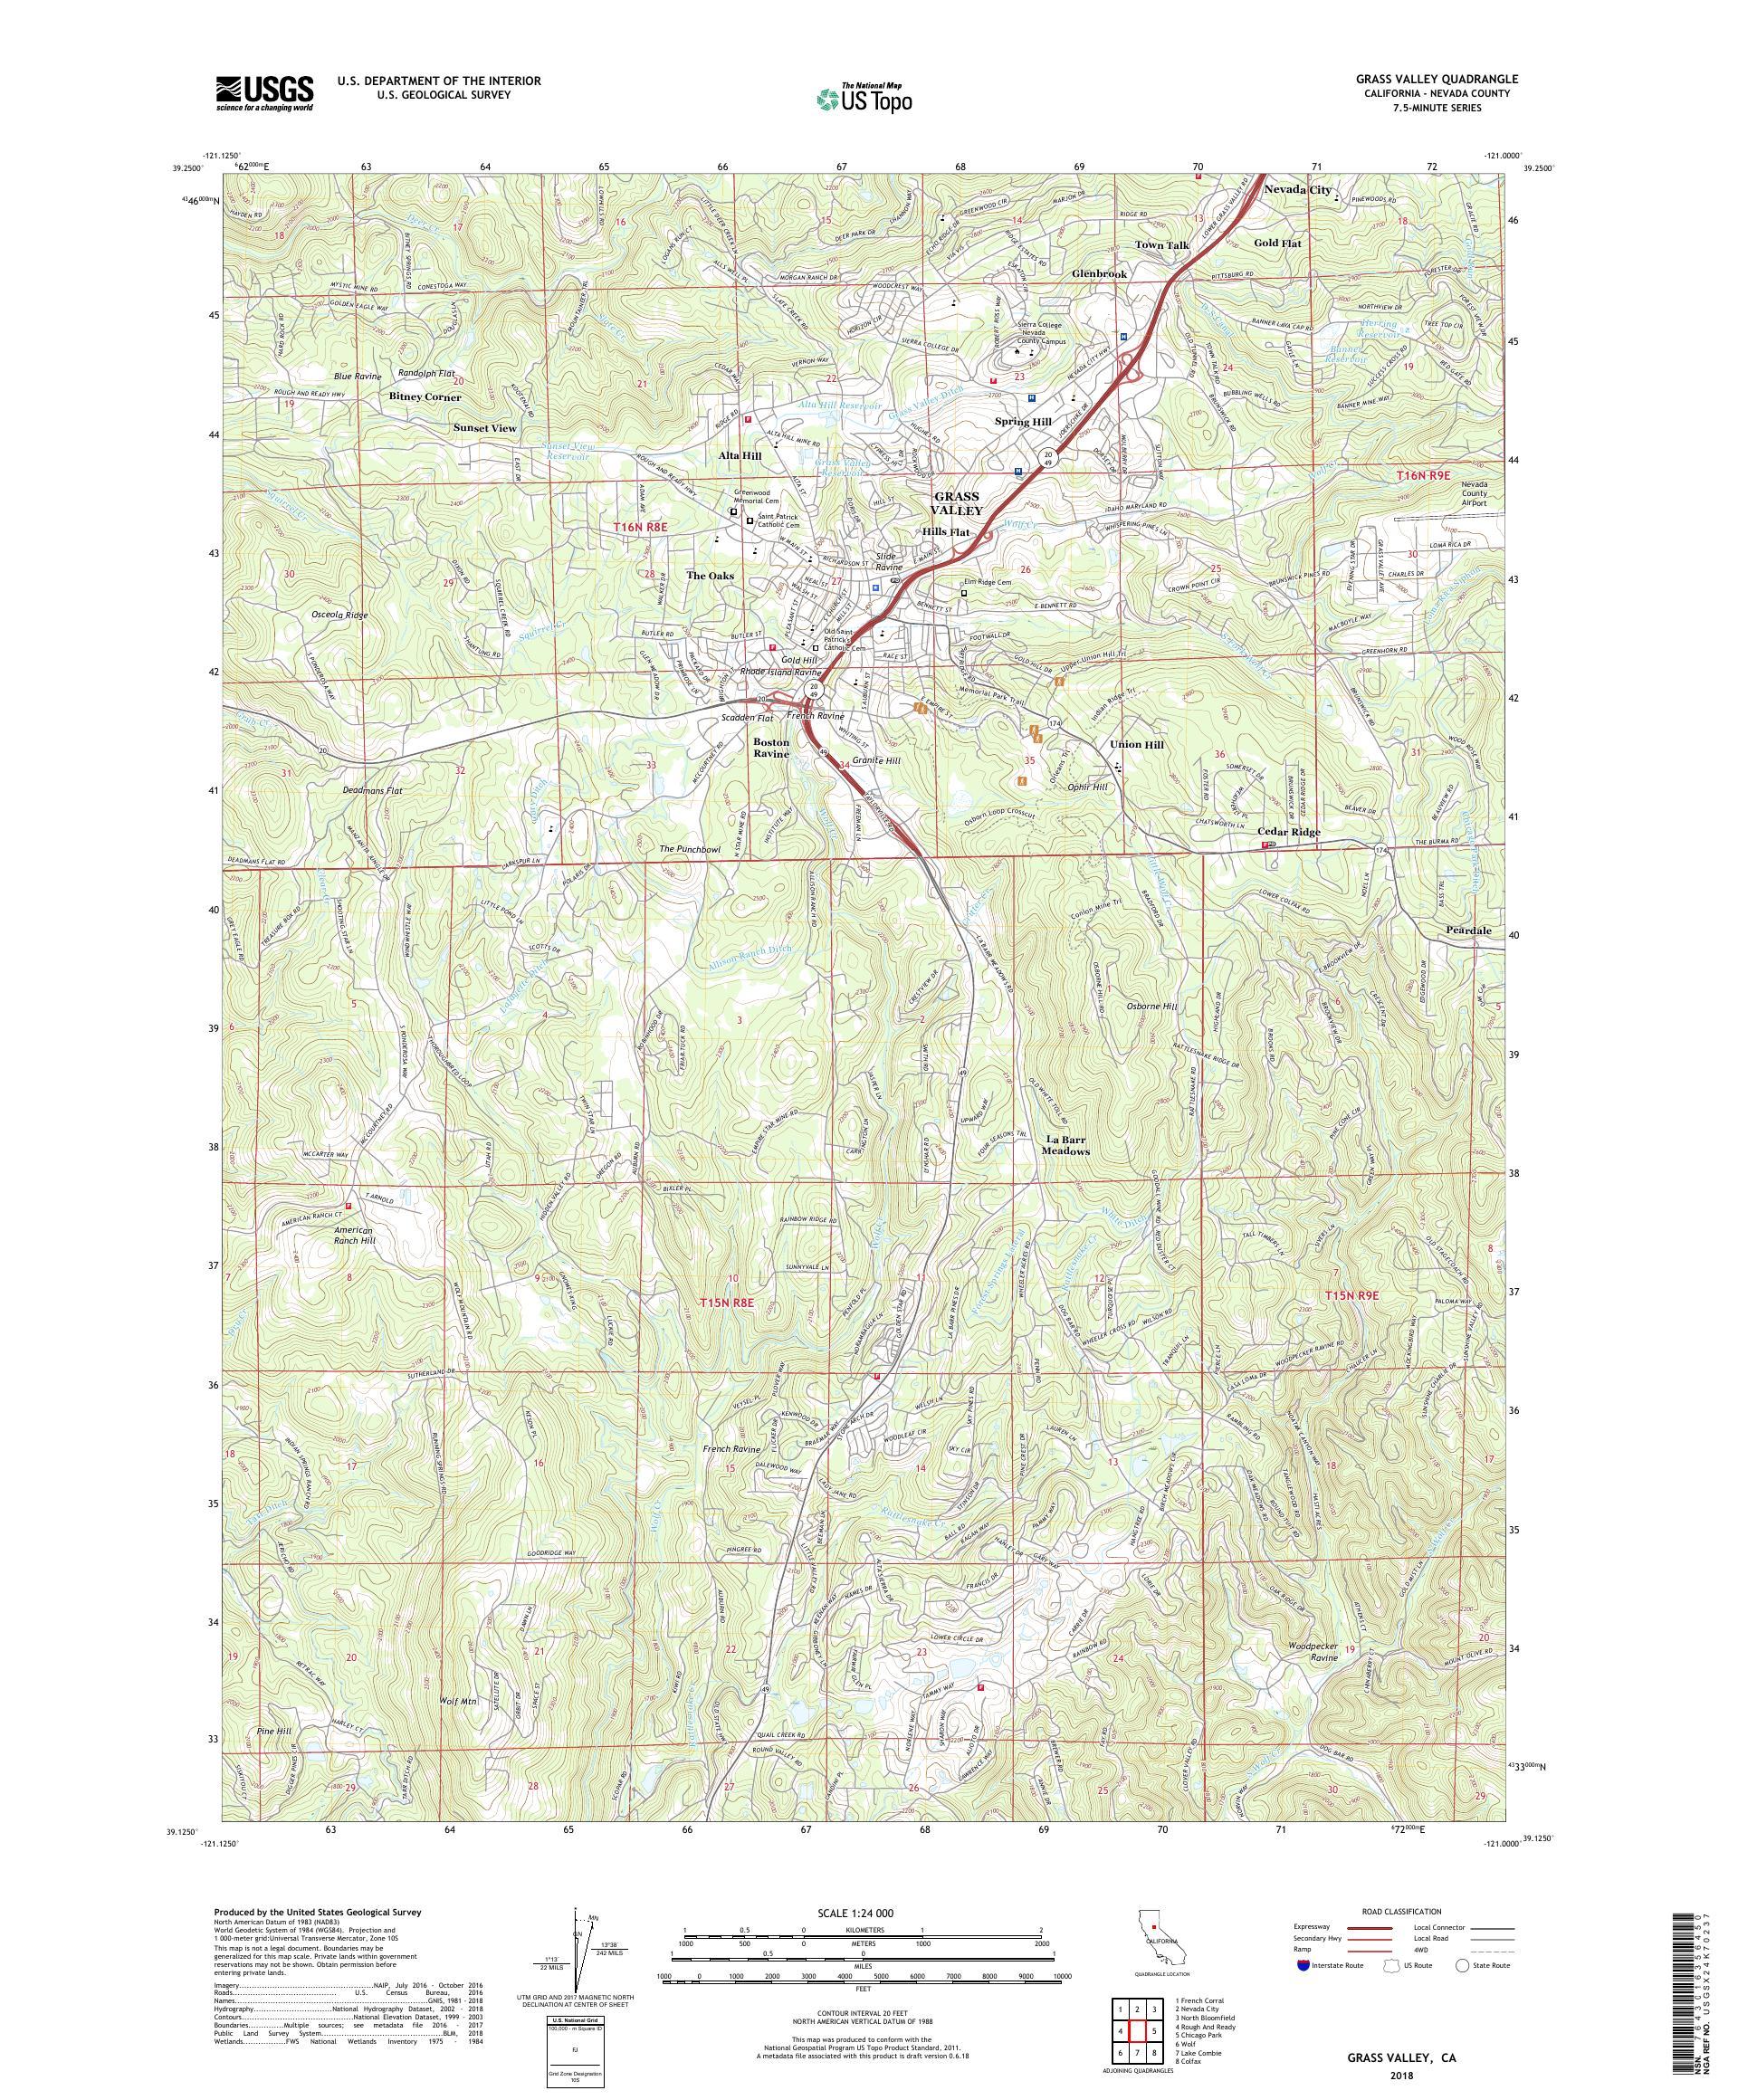 MyTopo Grass Valley, California USGS Quad Topo Map